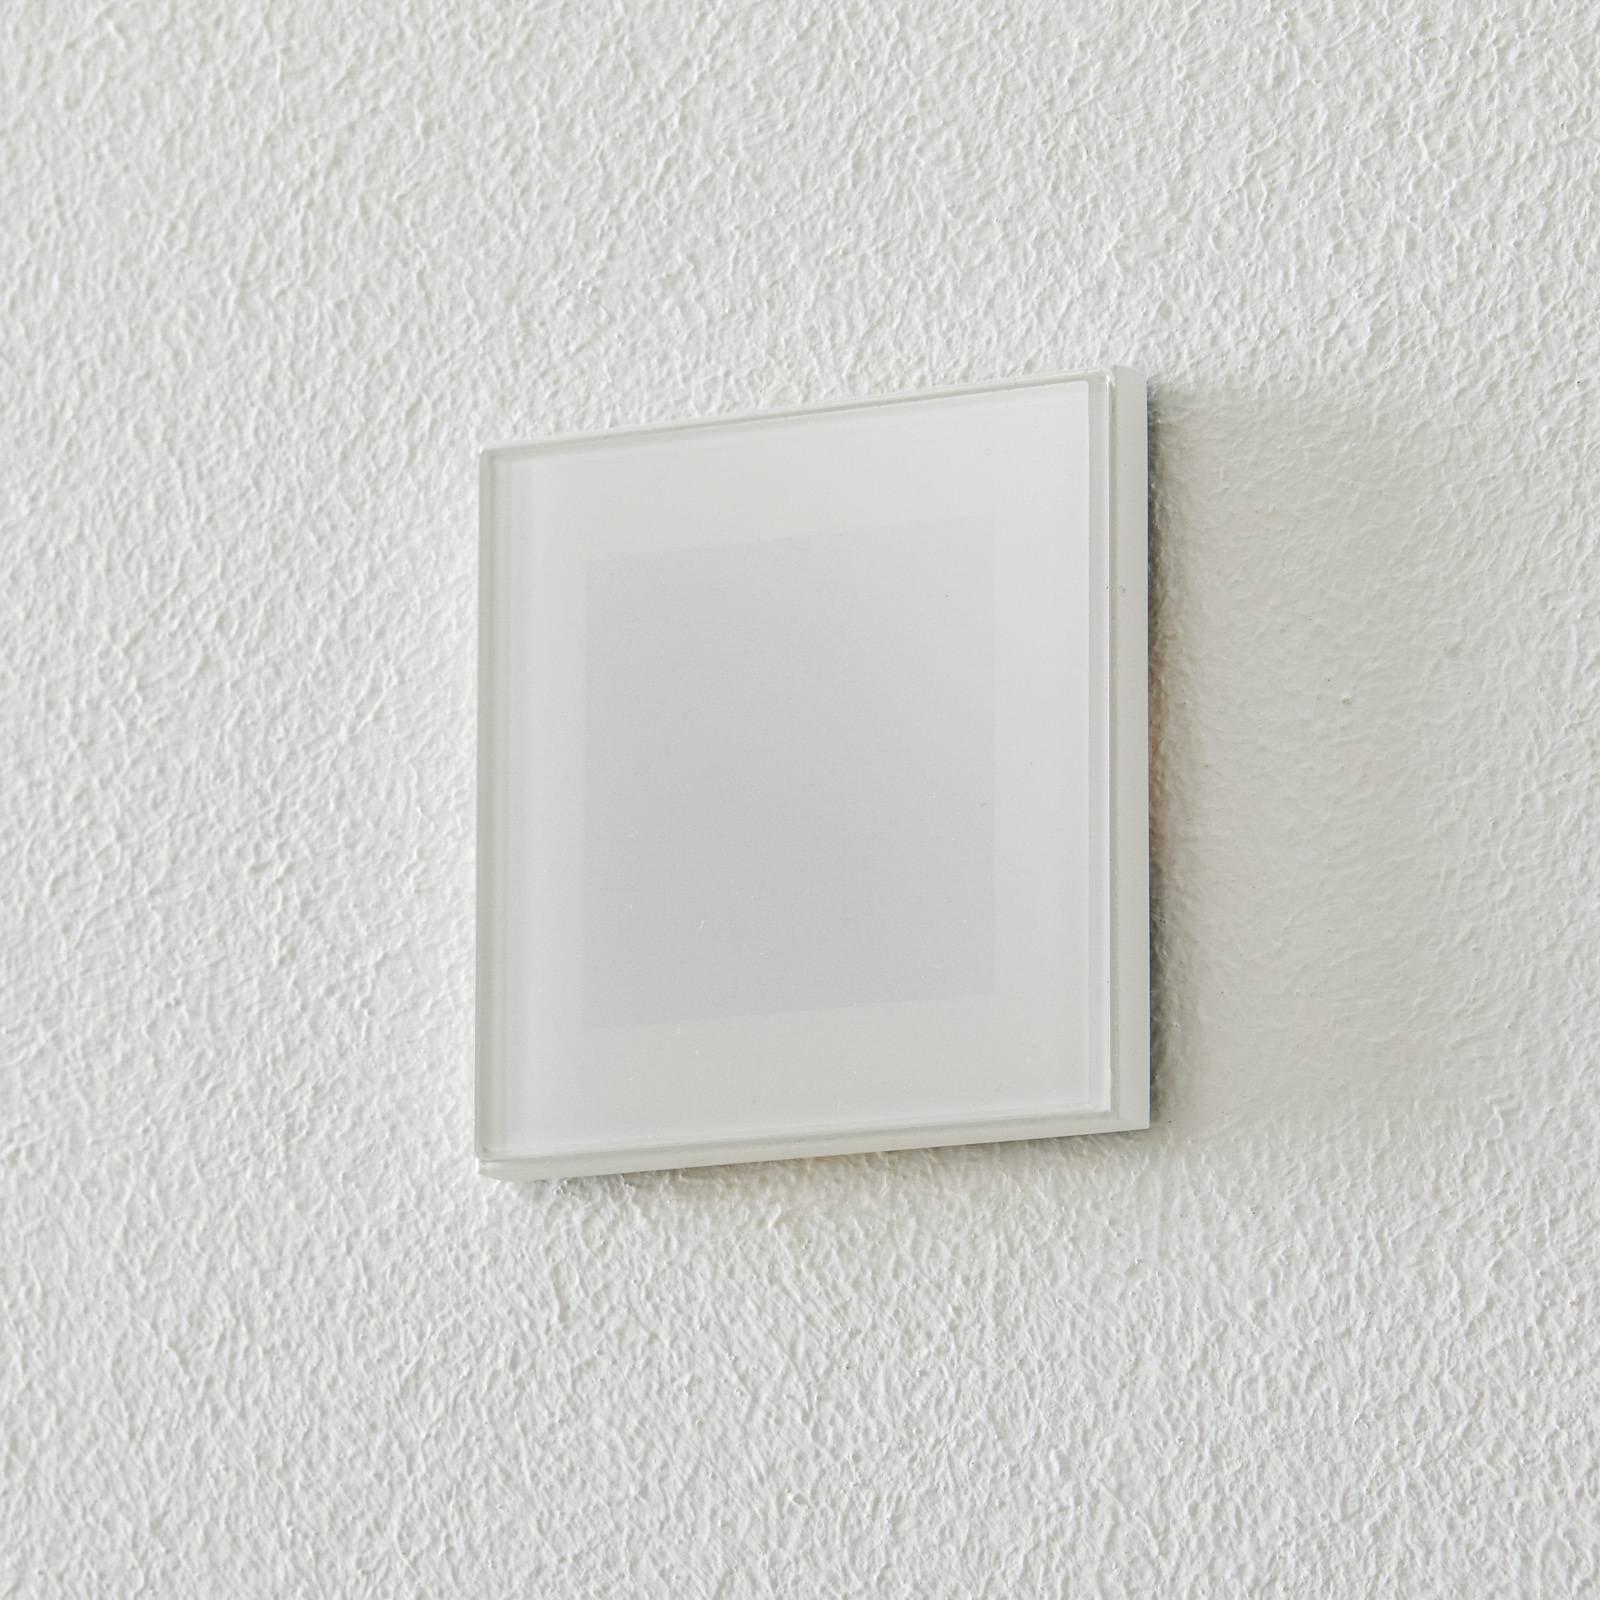 BEGA Accenta veggmontering kantet ring hvit 315lm